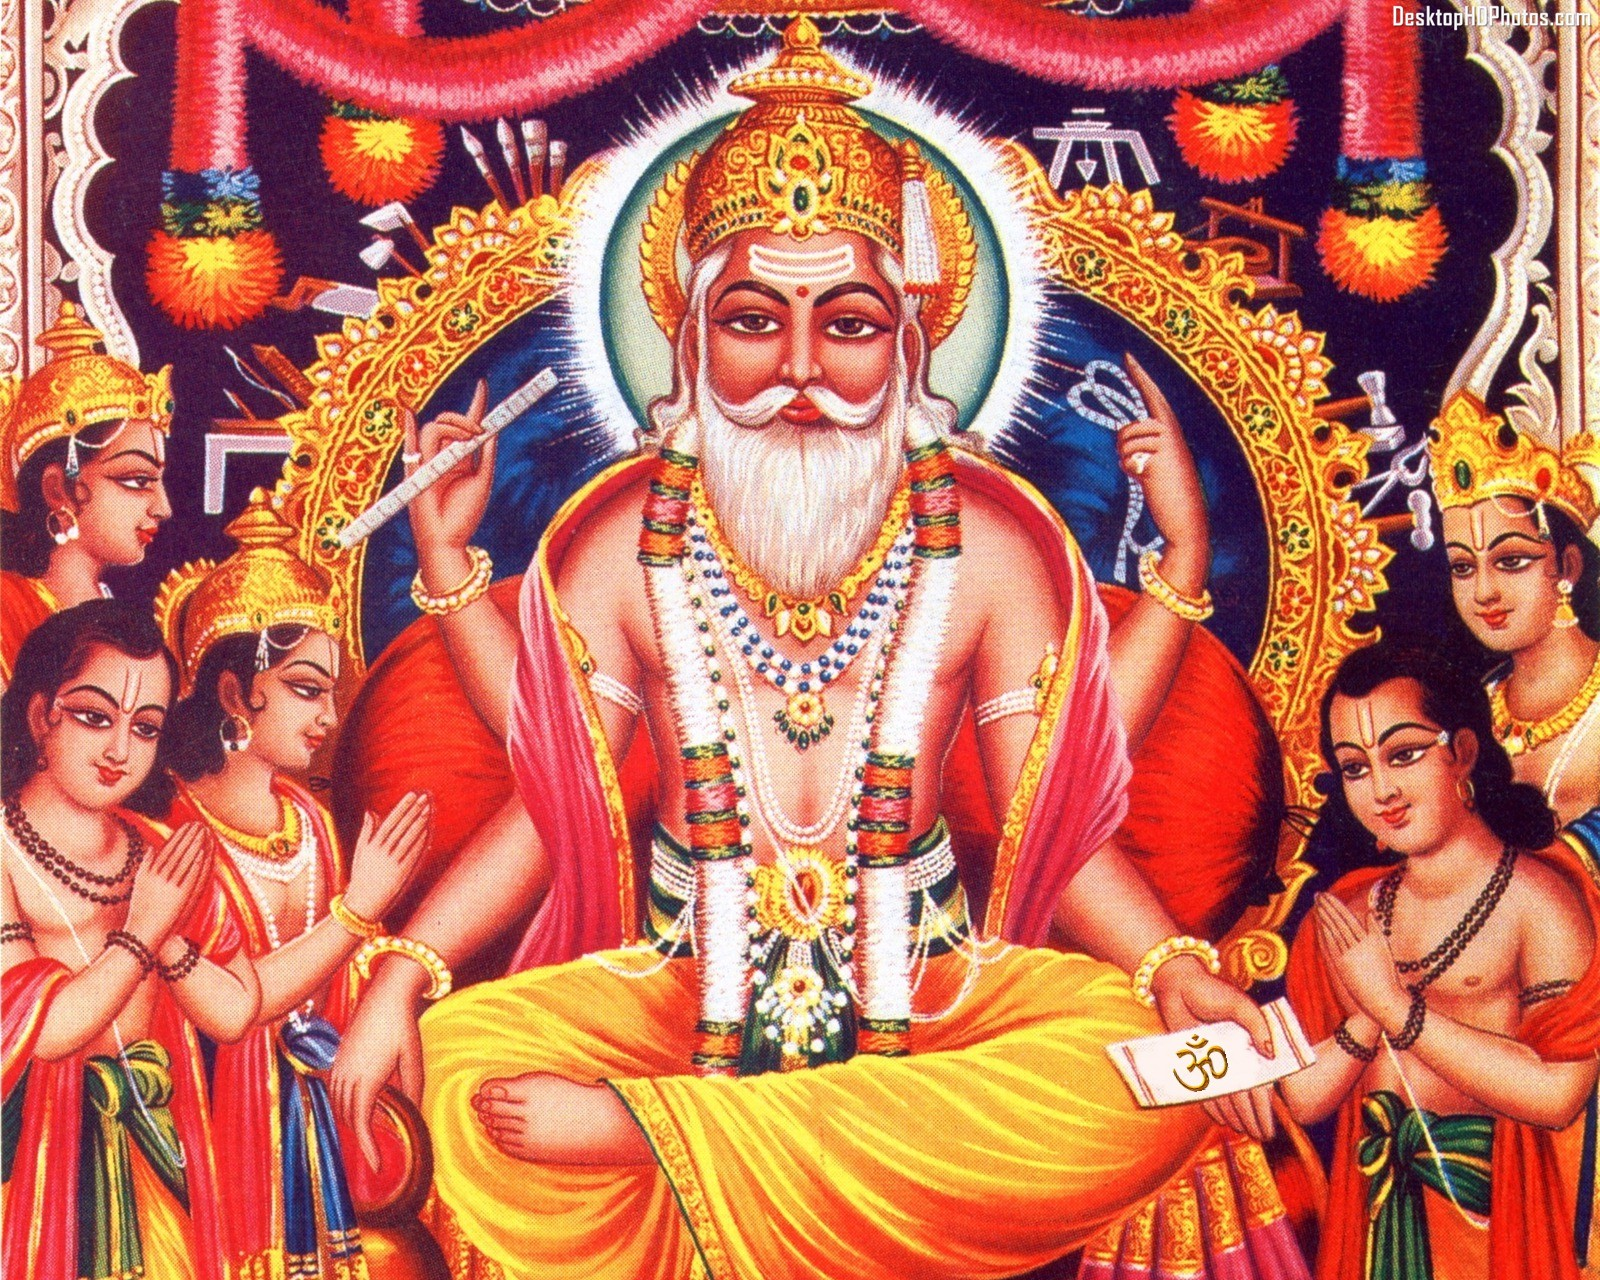 Most Inspiring Wallpaper Lord Vishwakarma - vishwakarma%2Bimages%2Bwish%2Bdownload%2B2016%2B%252815%2529  You Should Have_546727.jpg